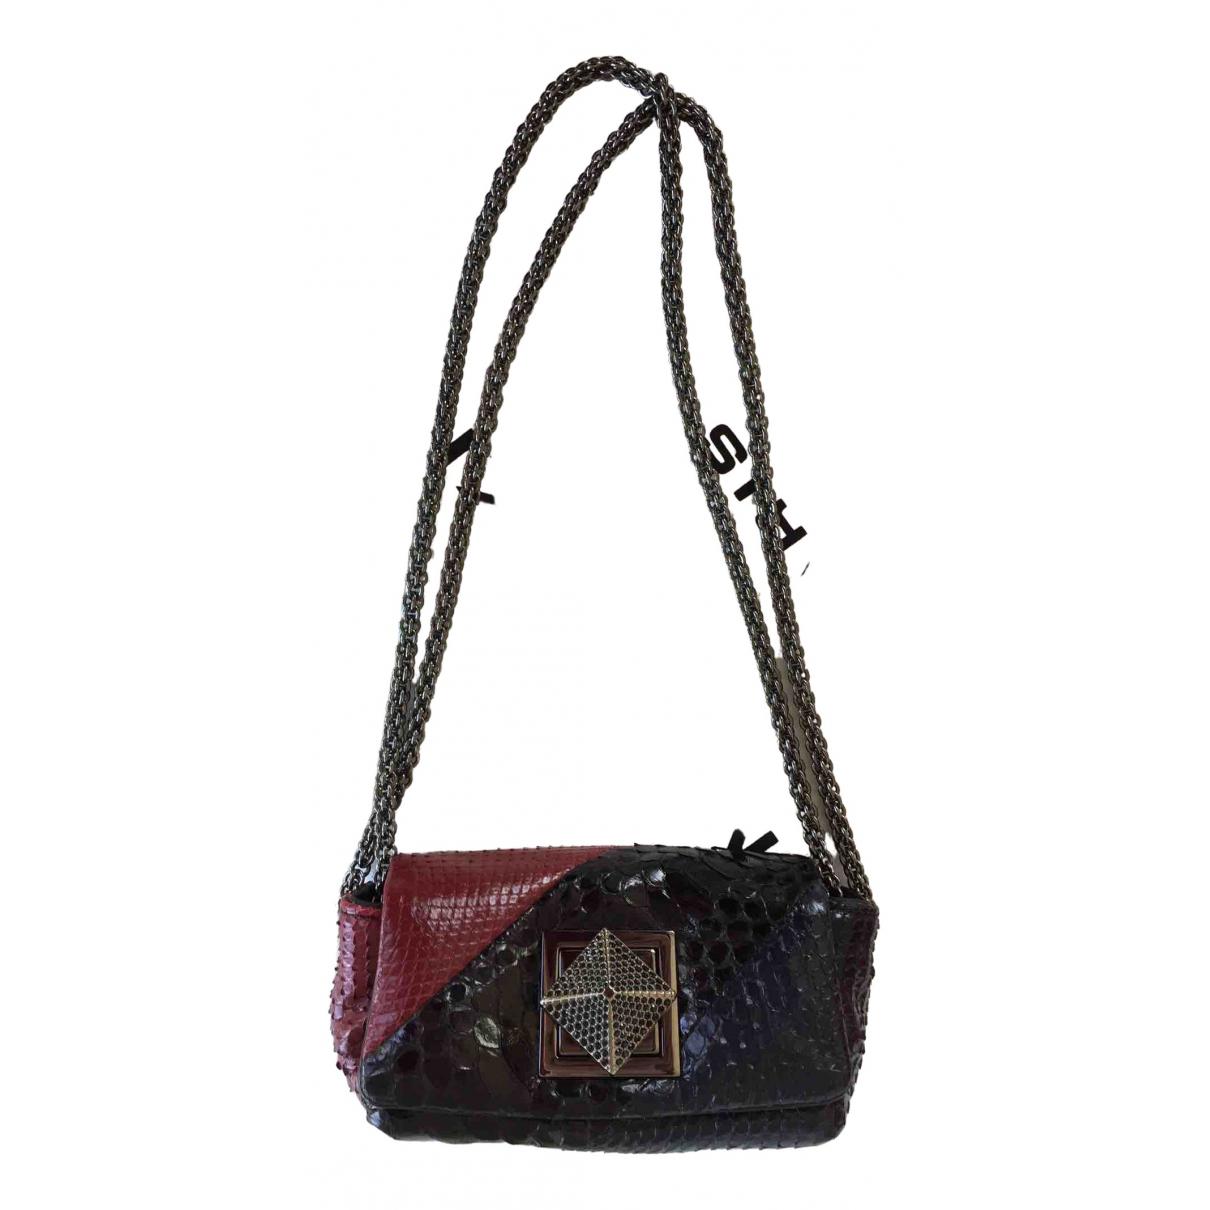 Sonia Rykiel Copain Multicolour Lizard handbag for Women \N